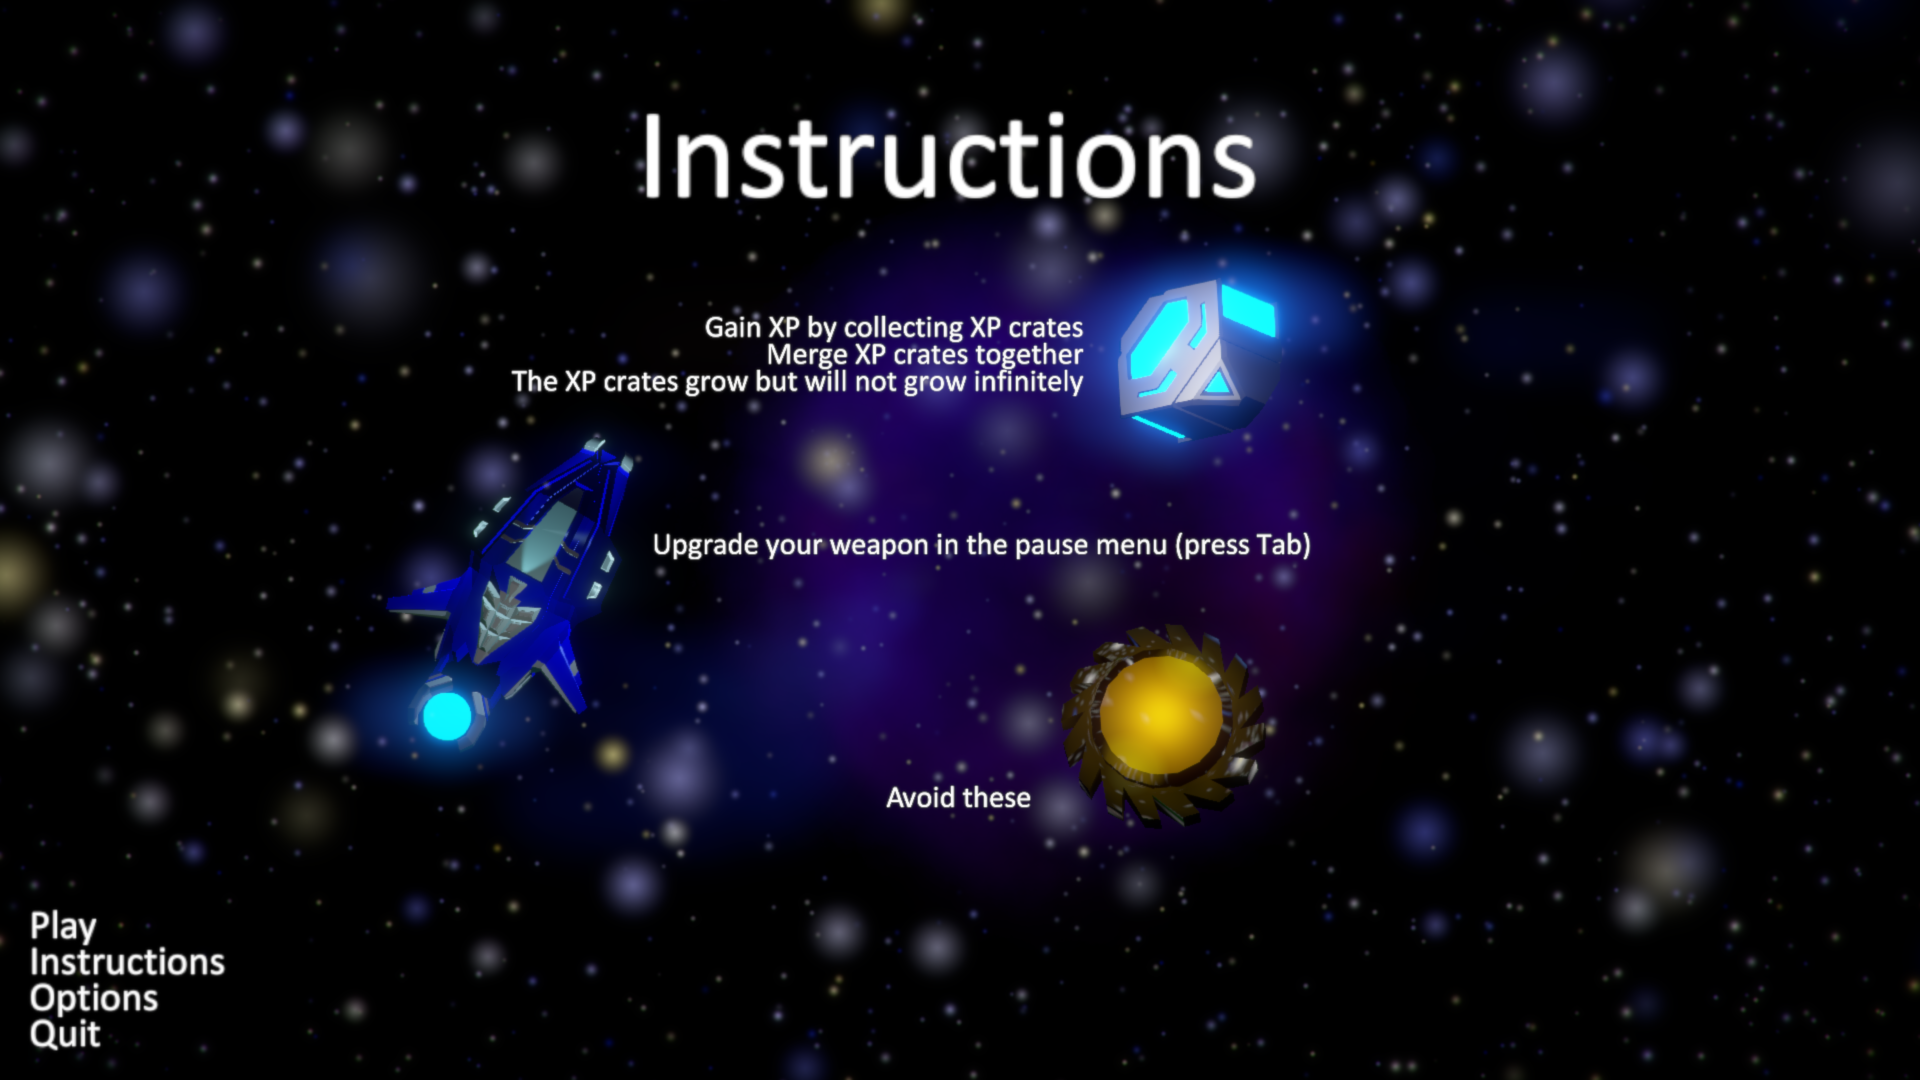 Instructions Menu